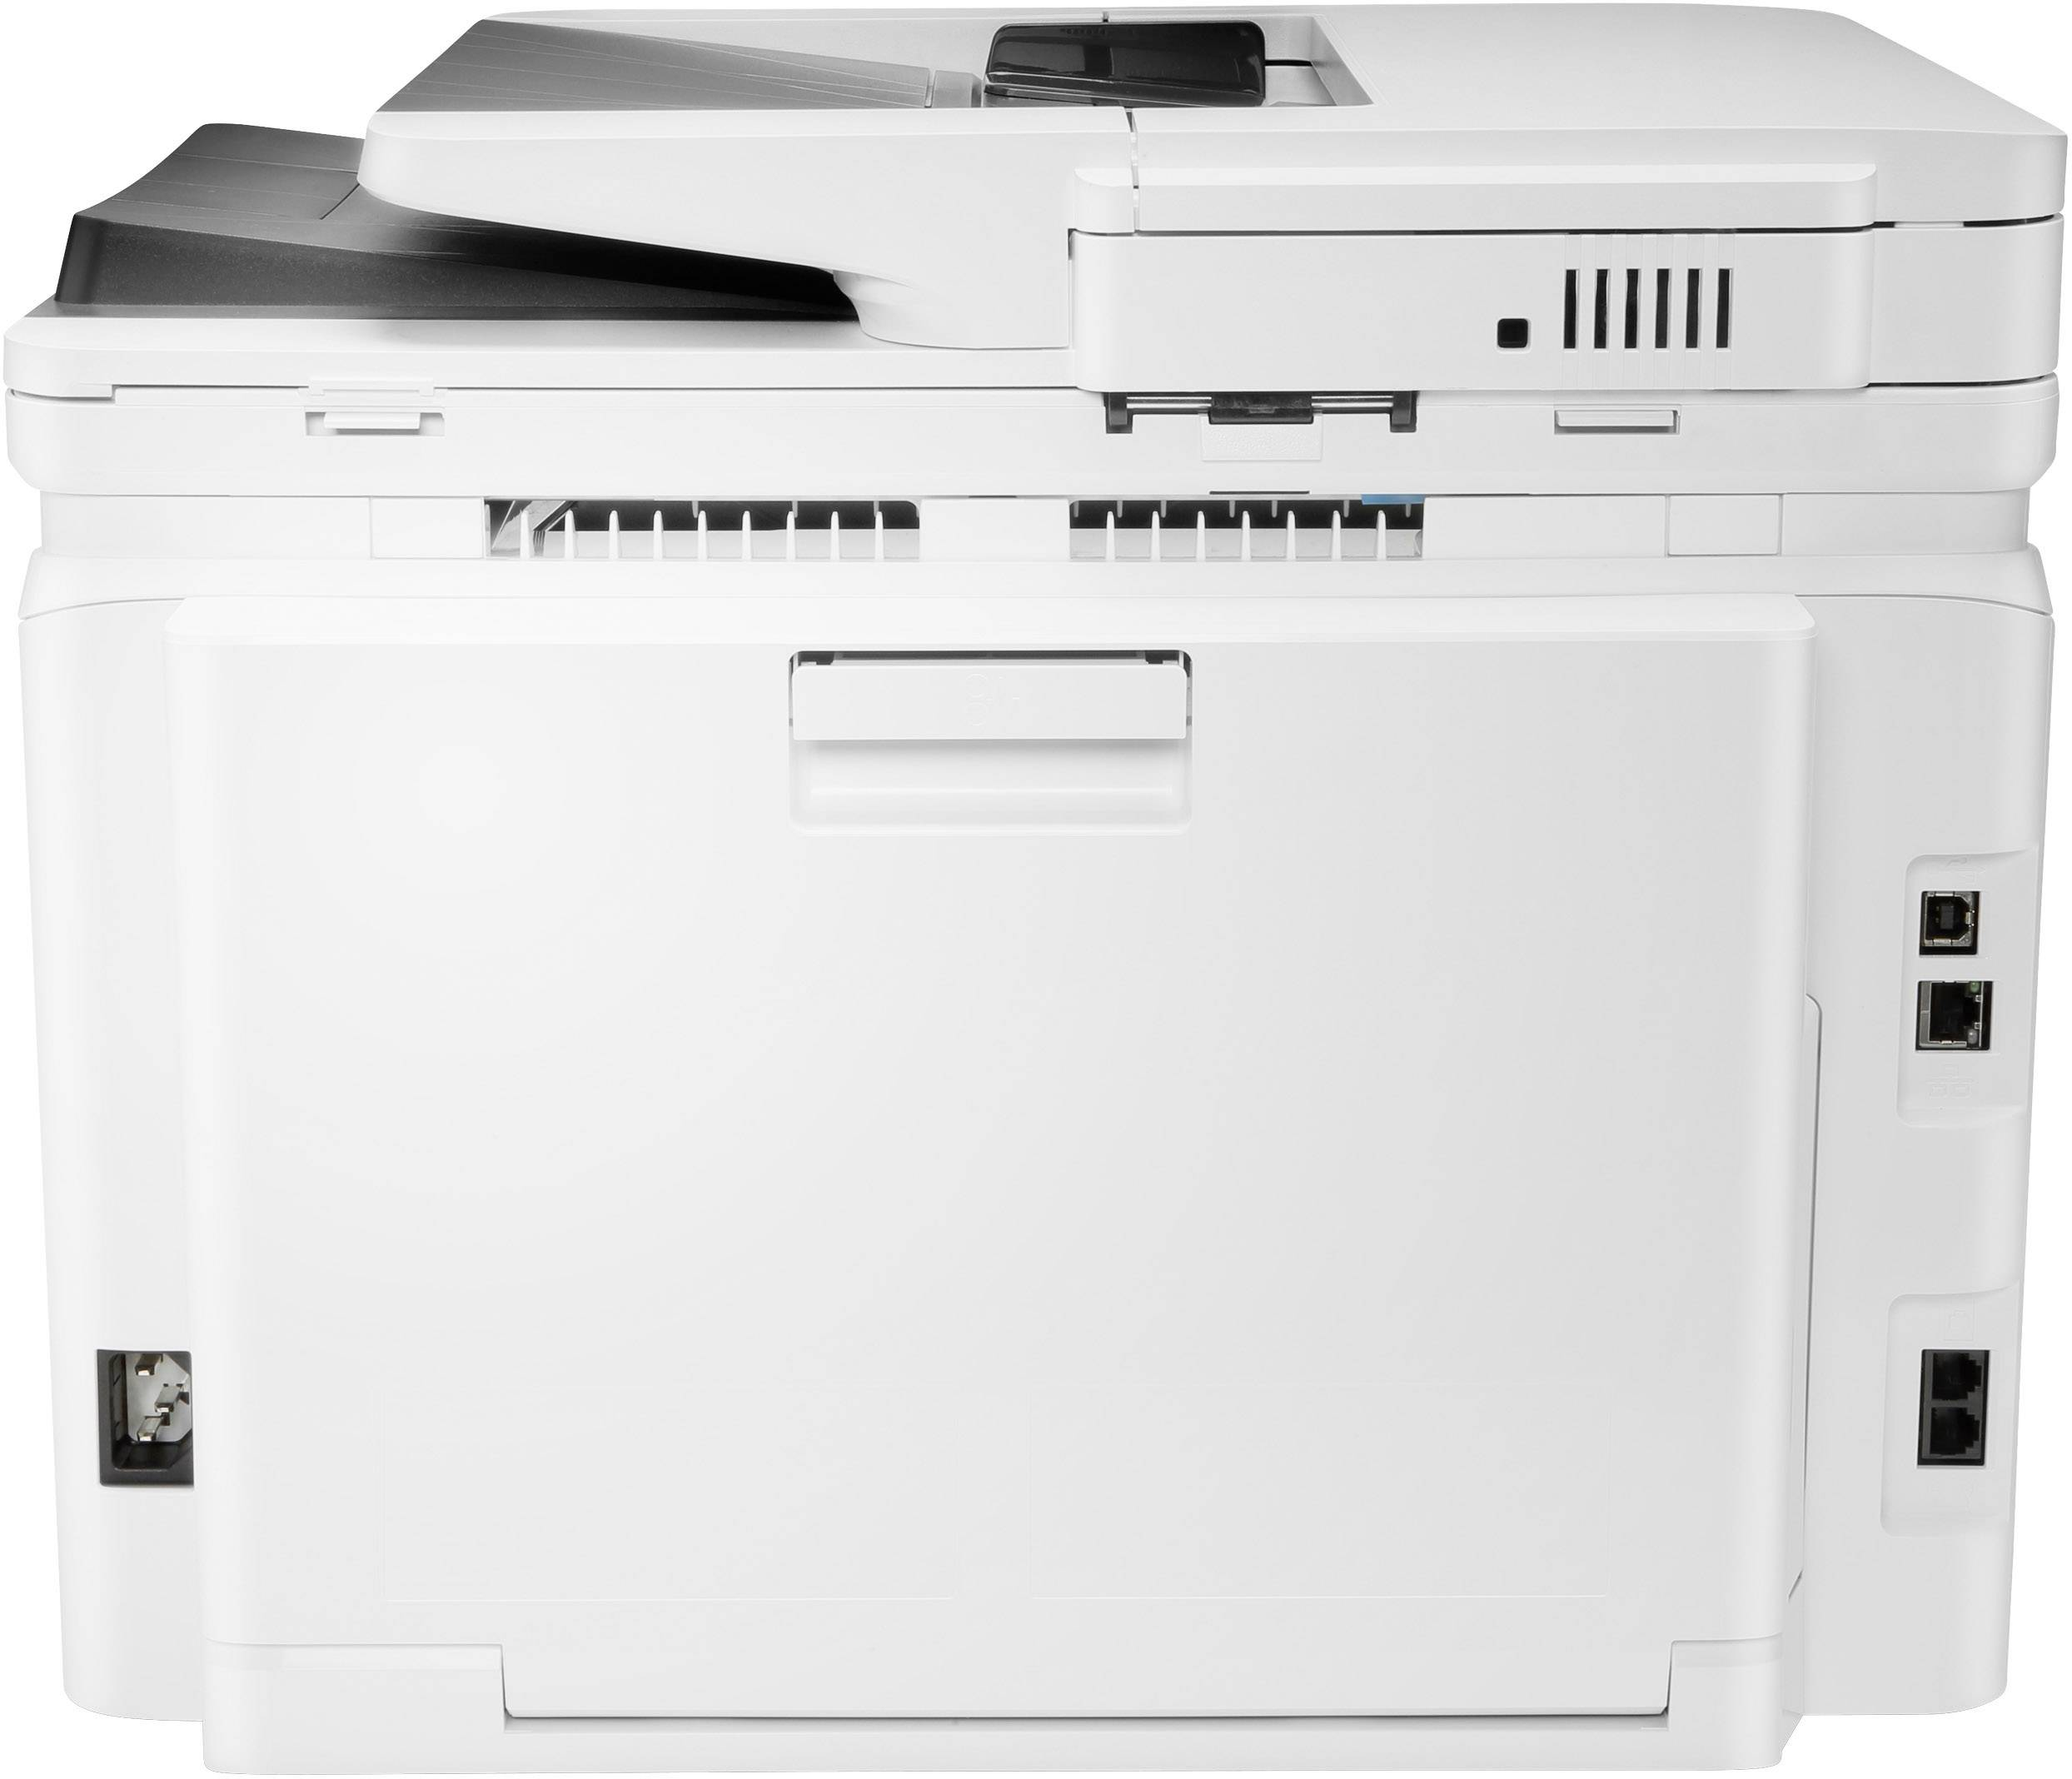 Hp Color Laserjet Pro Mfp M281fdw Colour Laser Multifunction Printer A4 Printer Scanner Copier